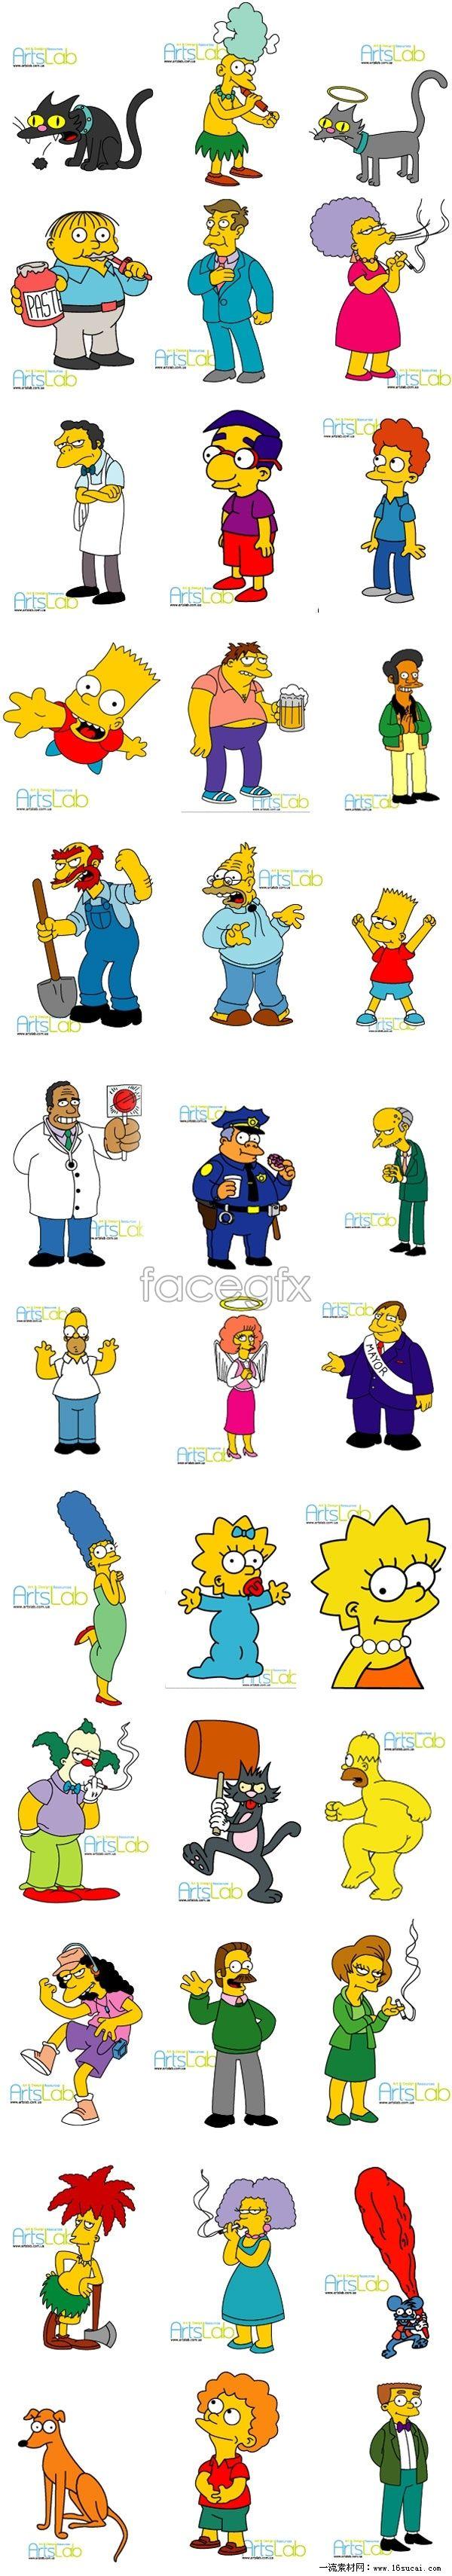 Cartoon Characters Simpsons : Best simpsons cartoon ideas on pinterest homer doh